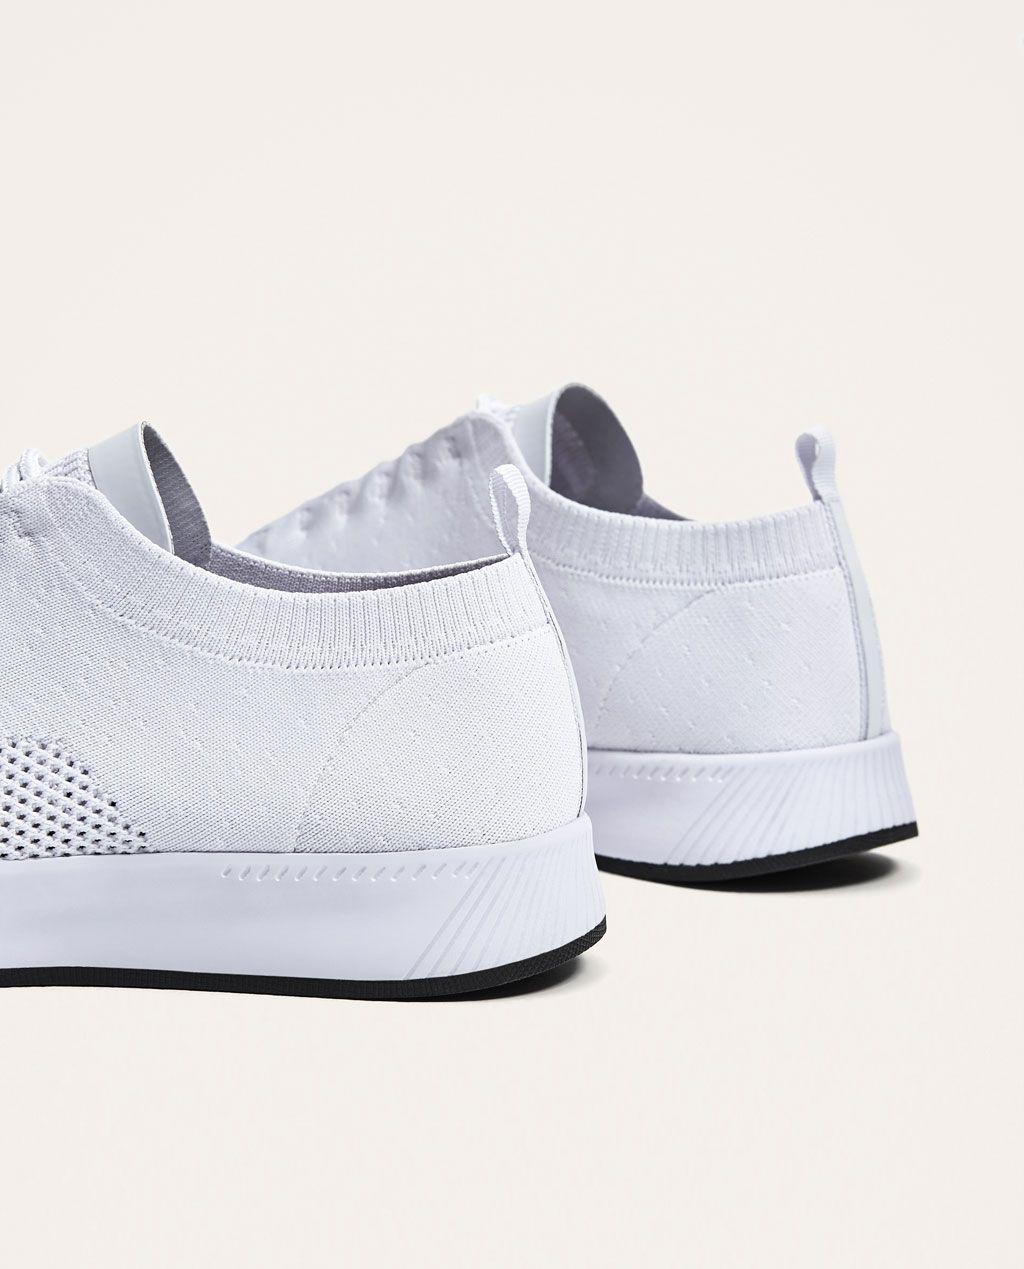 Ver Rebajas Deportivo Técnico Zara Zapatos Todo Hombre Tejido qwfOnExOBR